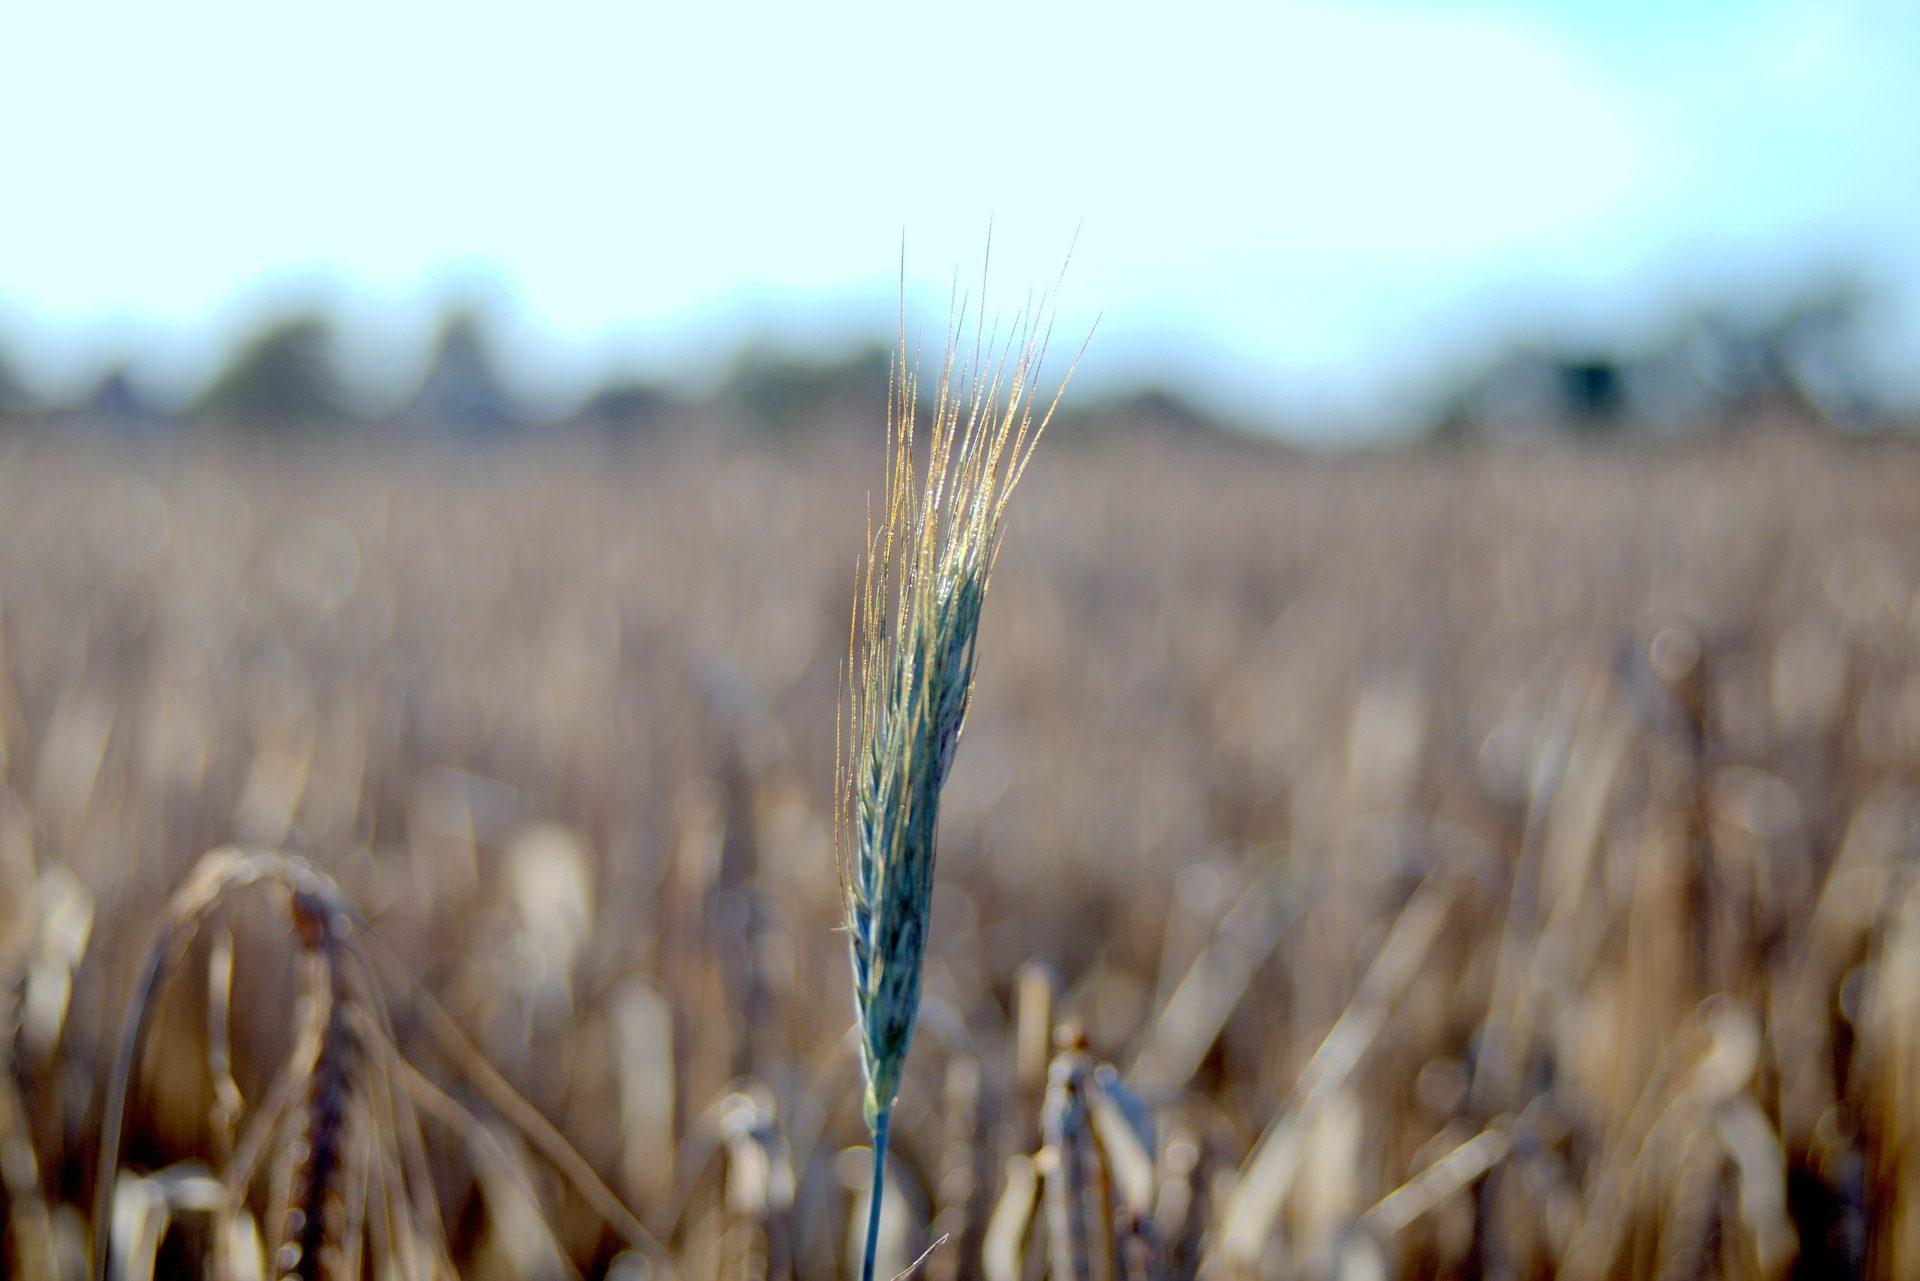 Tang, blé, Plantation, domaine, culture - Fonds d'écran HD - Professor-falken.com